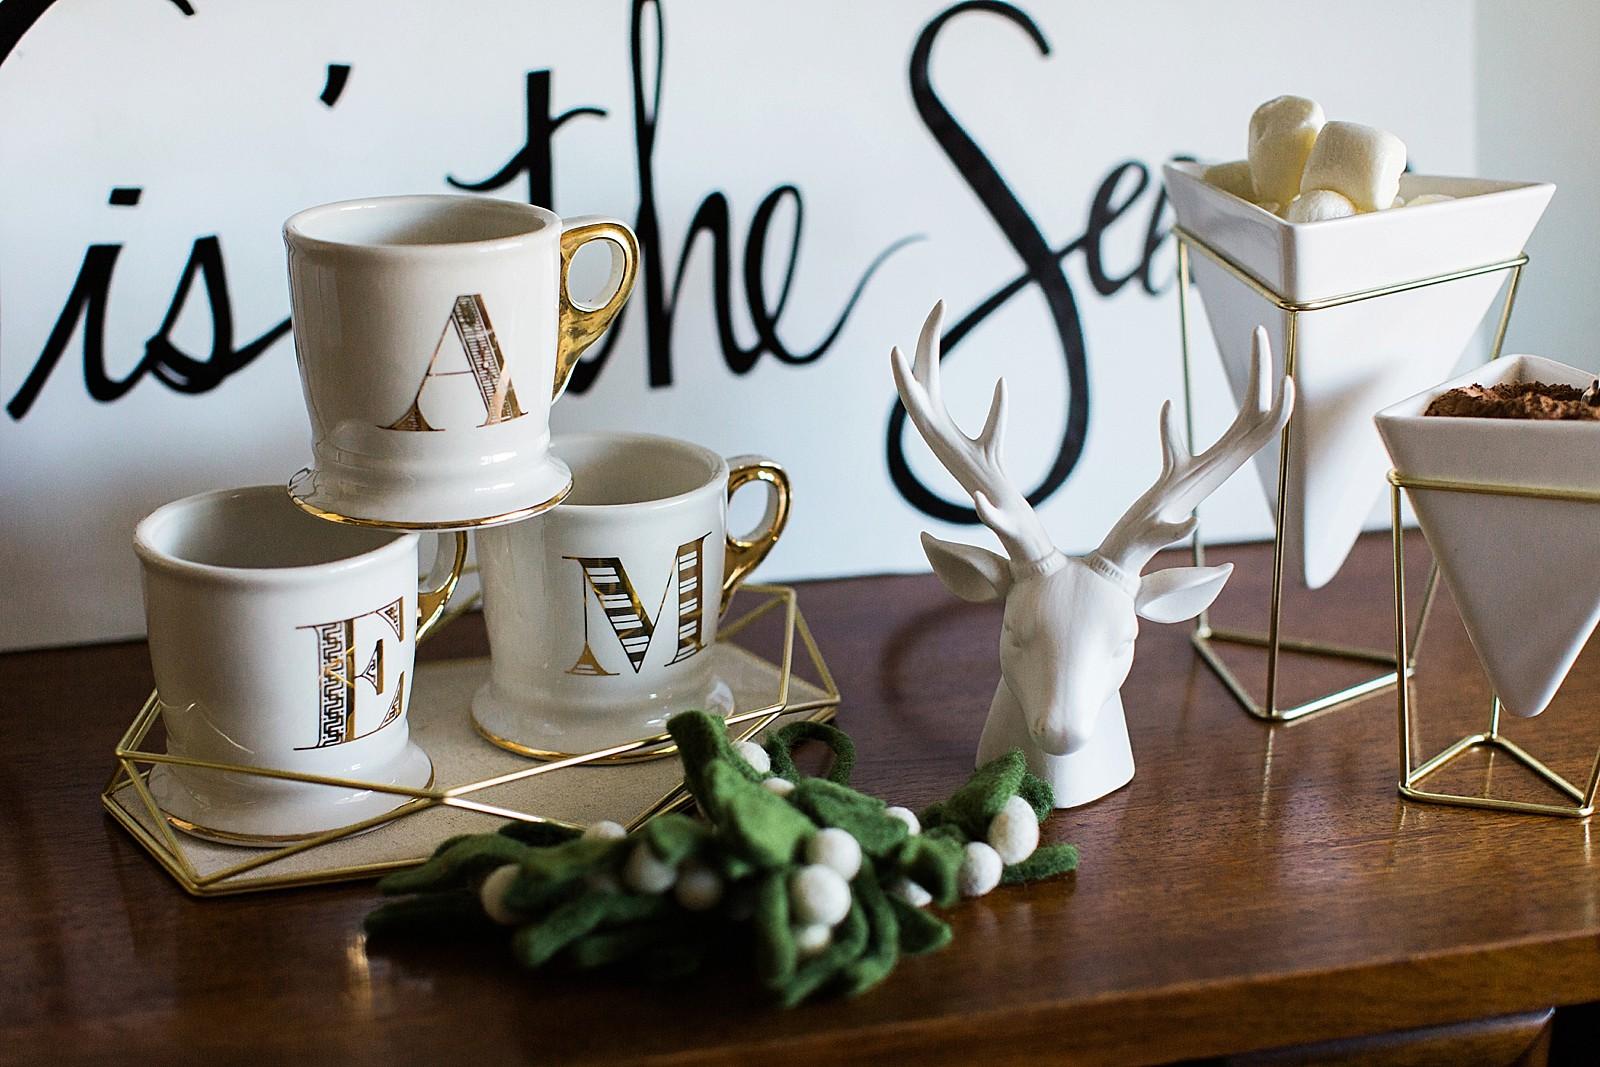 umbra-diana-elizabeth-modern-glam-christmas-decor-gift-giving-frame-ideas-3006